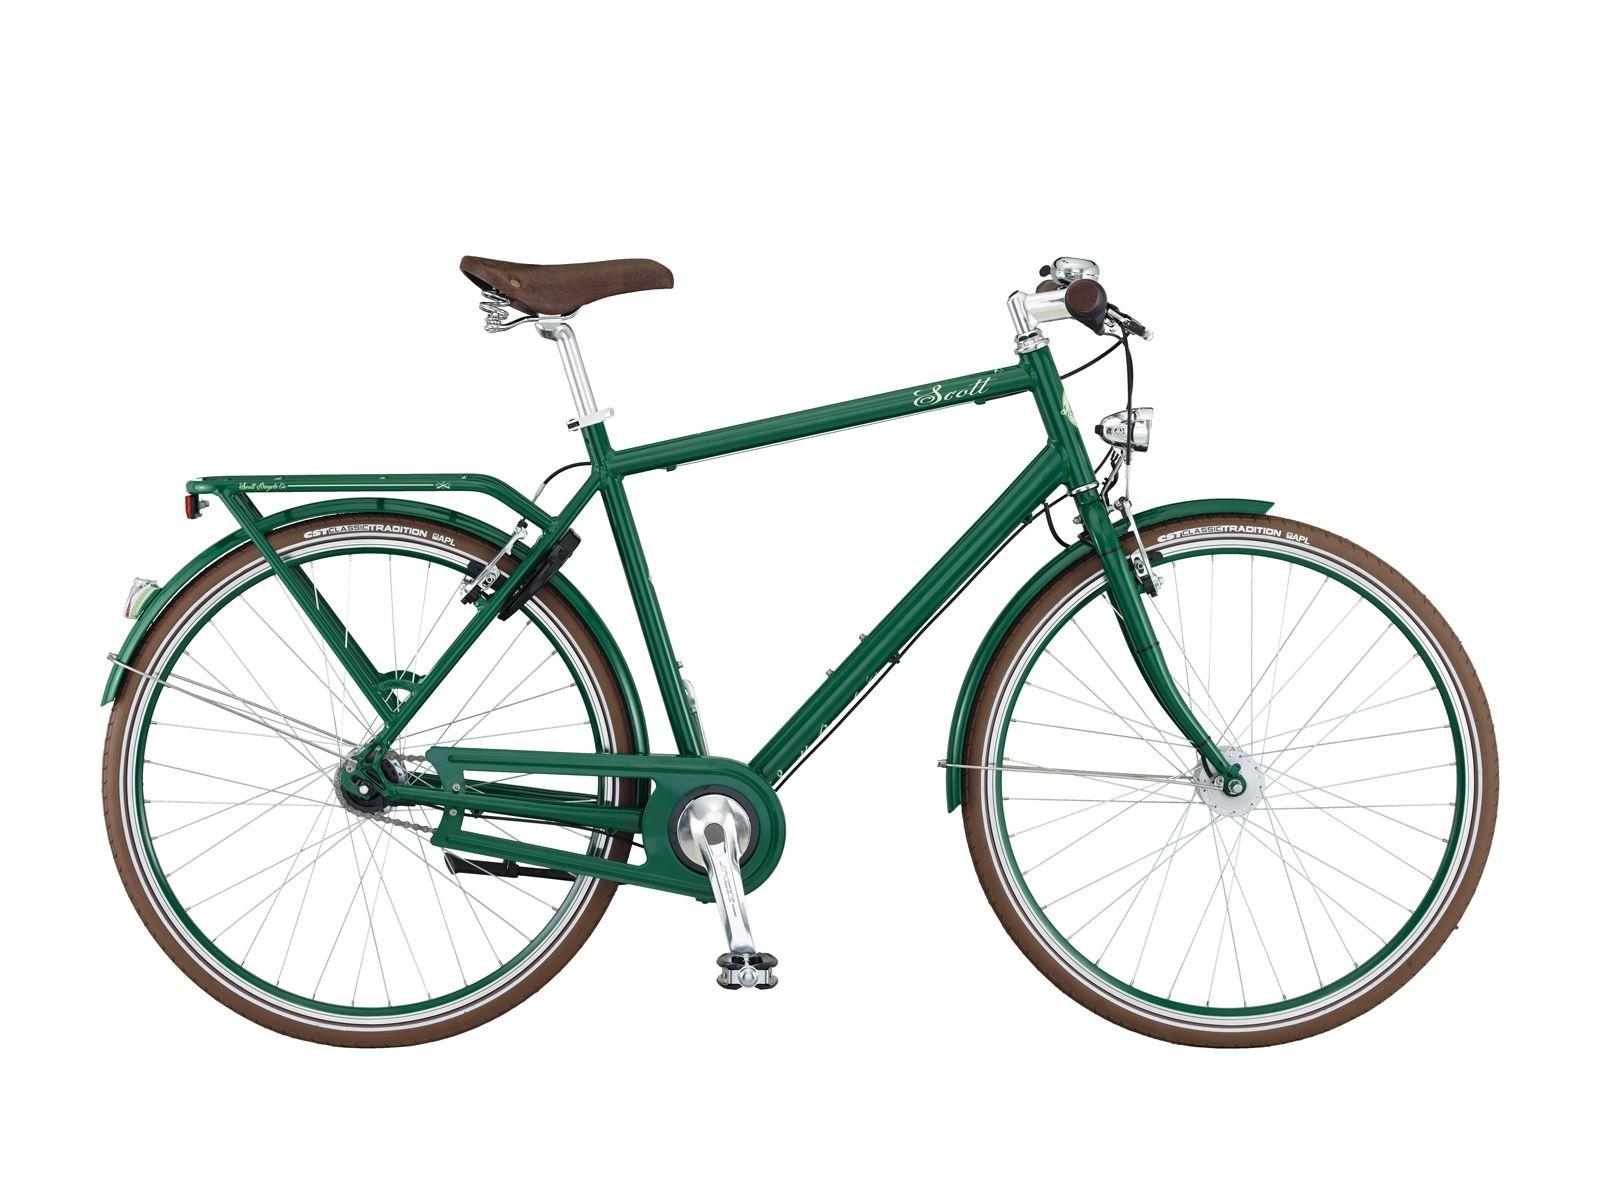 Scott Sub Retro 2015 - Cityrad | Scott Fahrräder, Fahrrad rahmen und ...